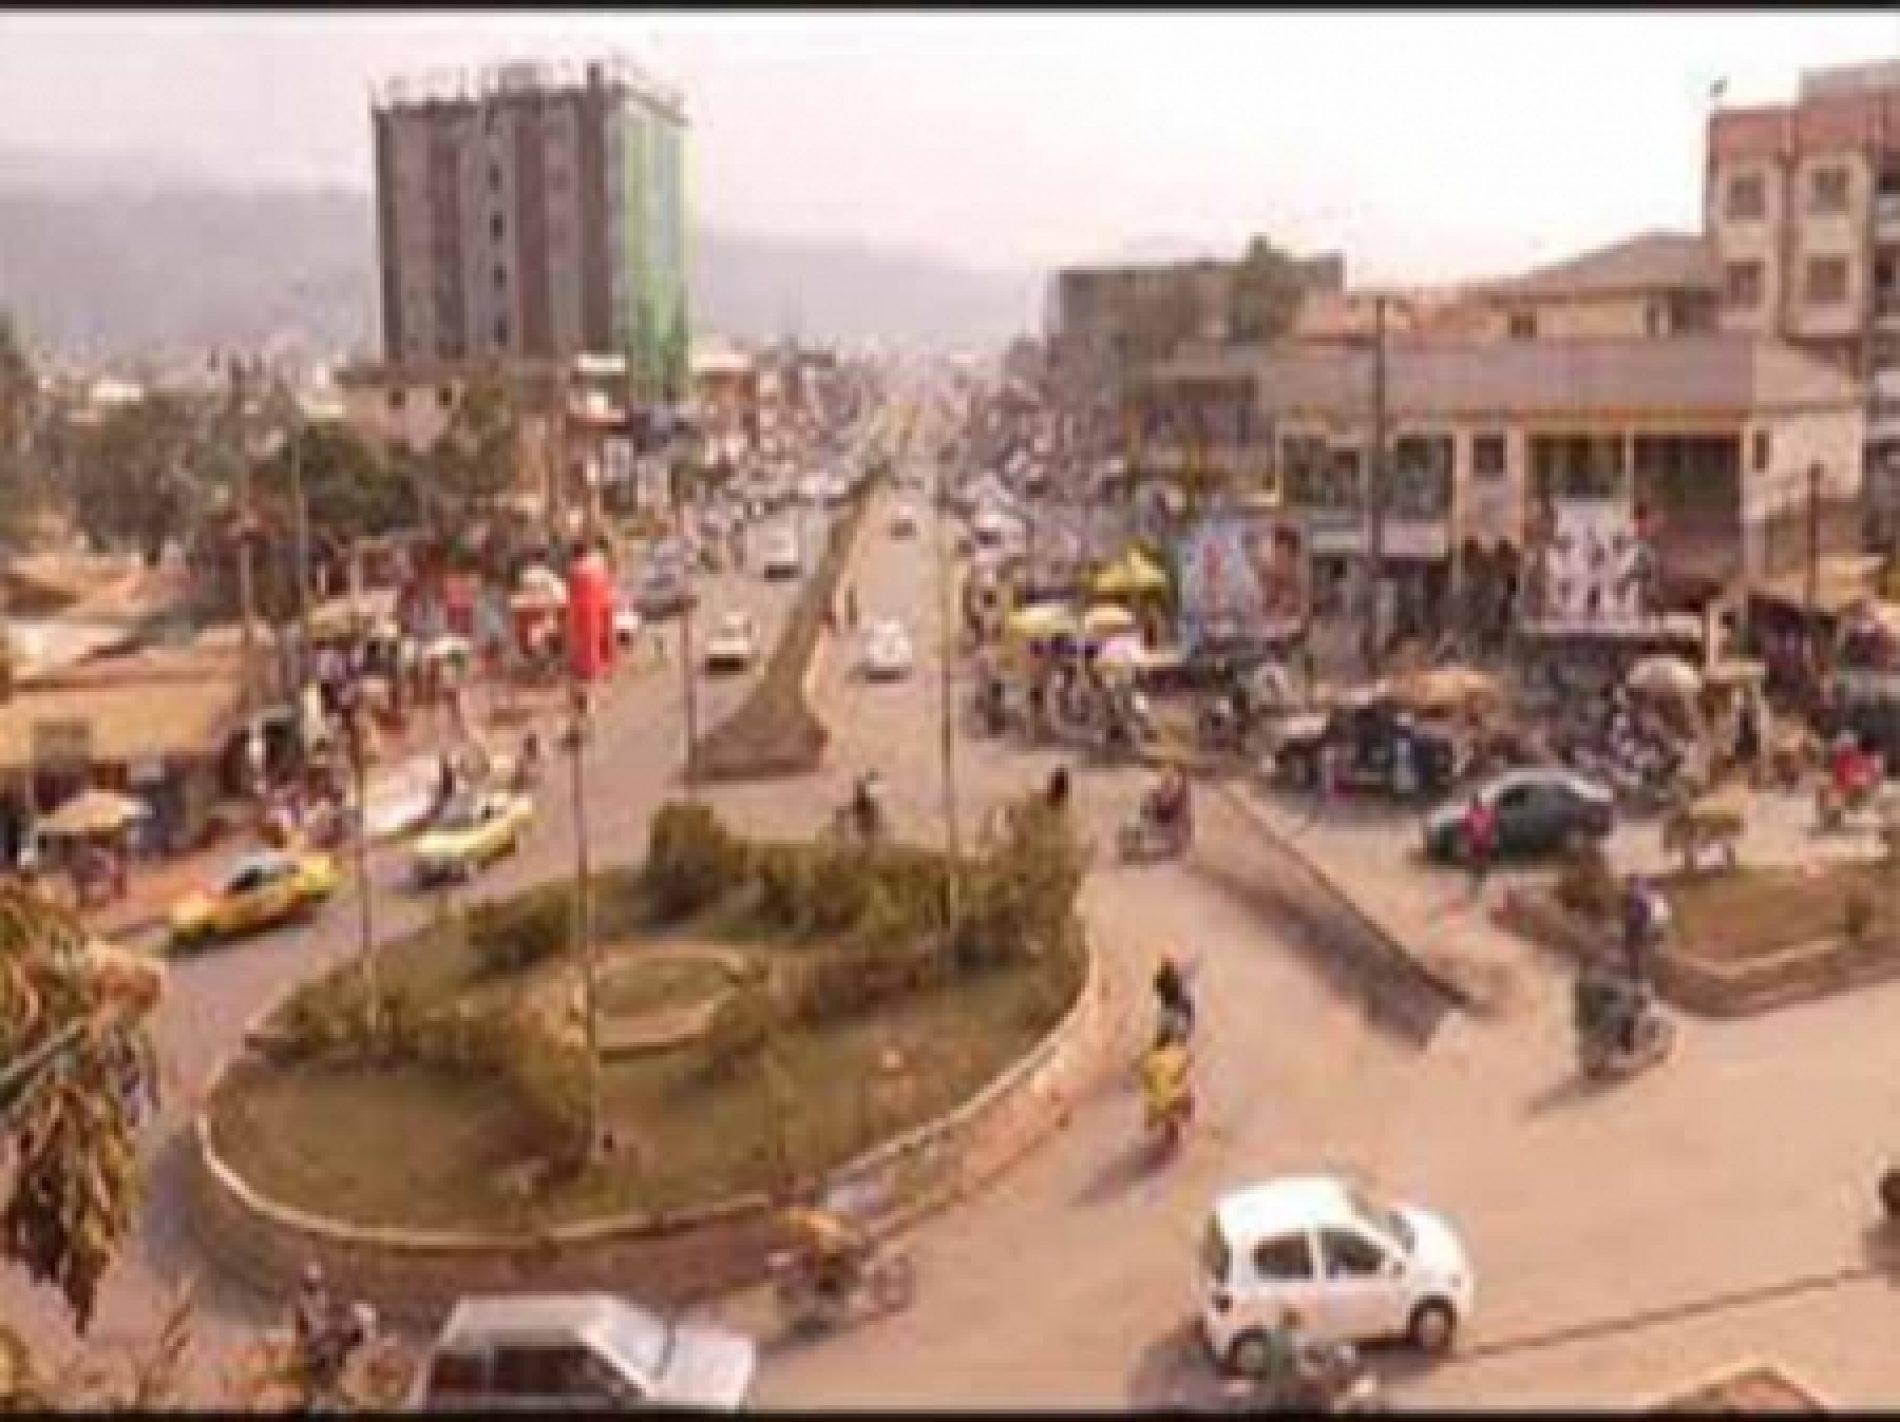 Bamenda council: Road infrastructure debates postponed